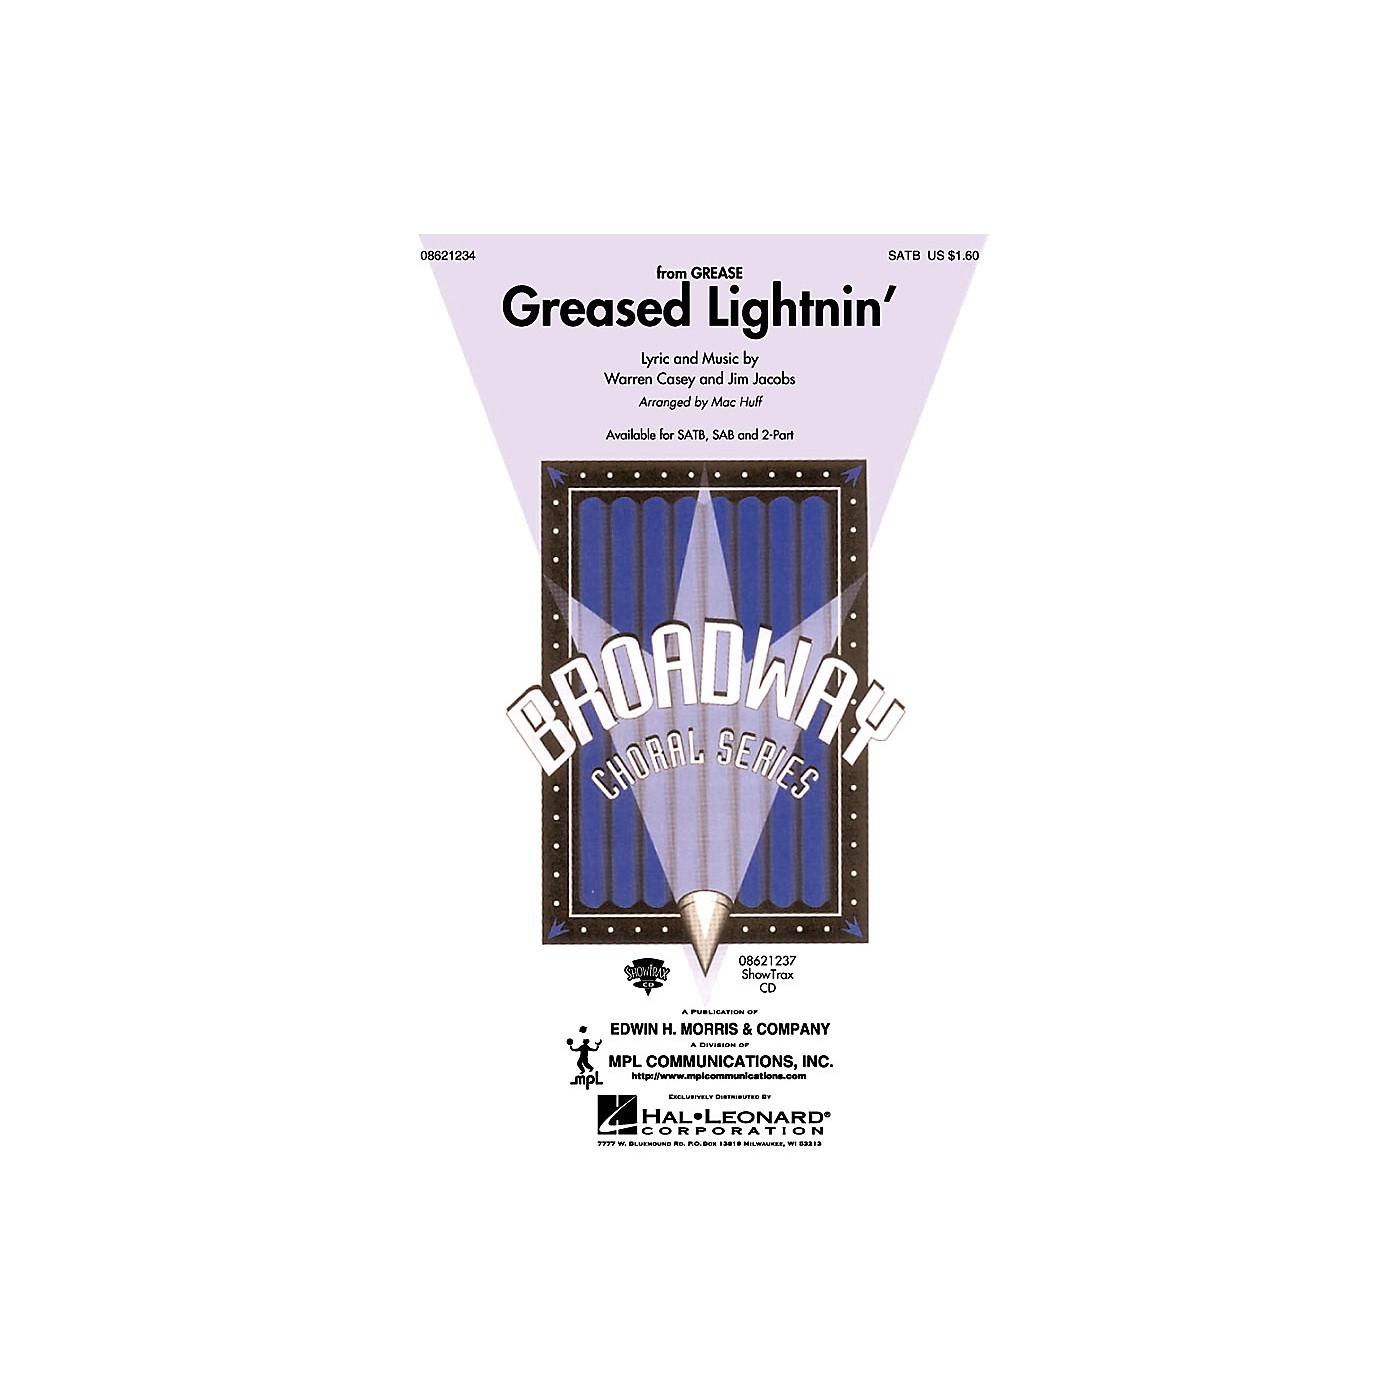 Hal Leonard Greased Lightnin' (from Grease) (SATB) SATB arranged by Mac Huff thumbnail